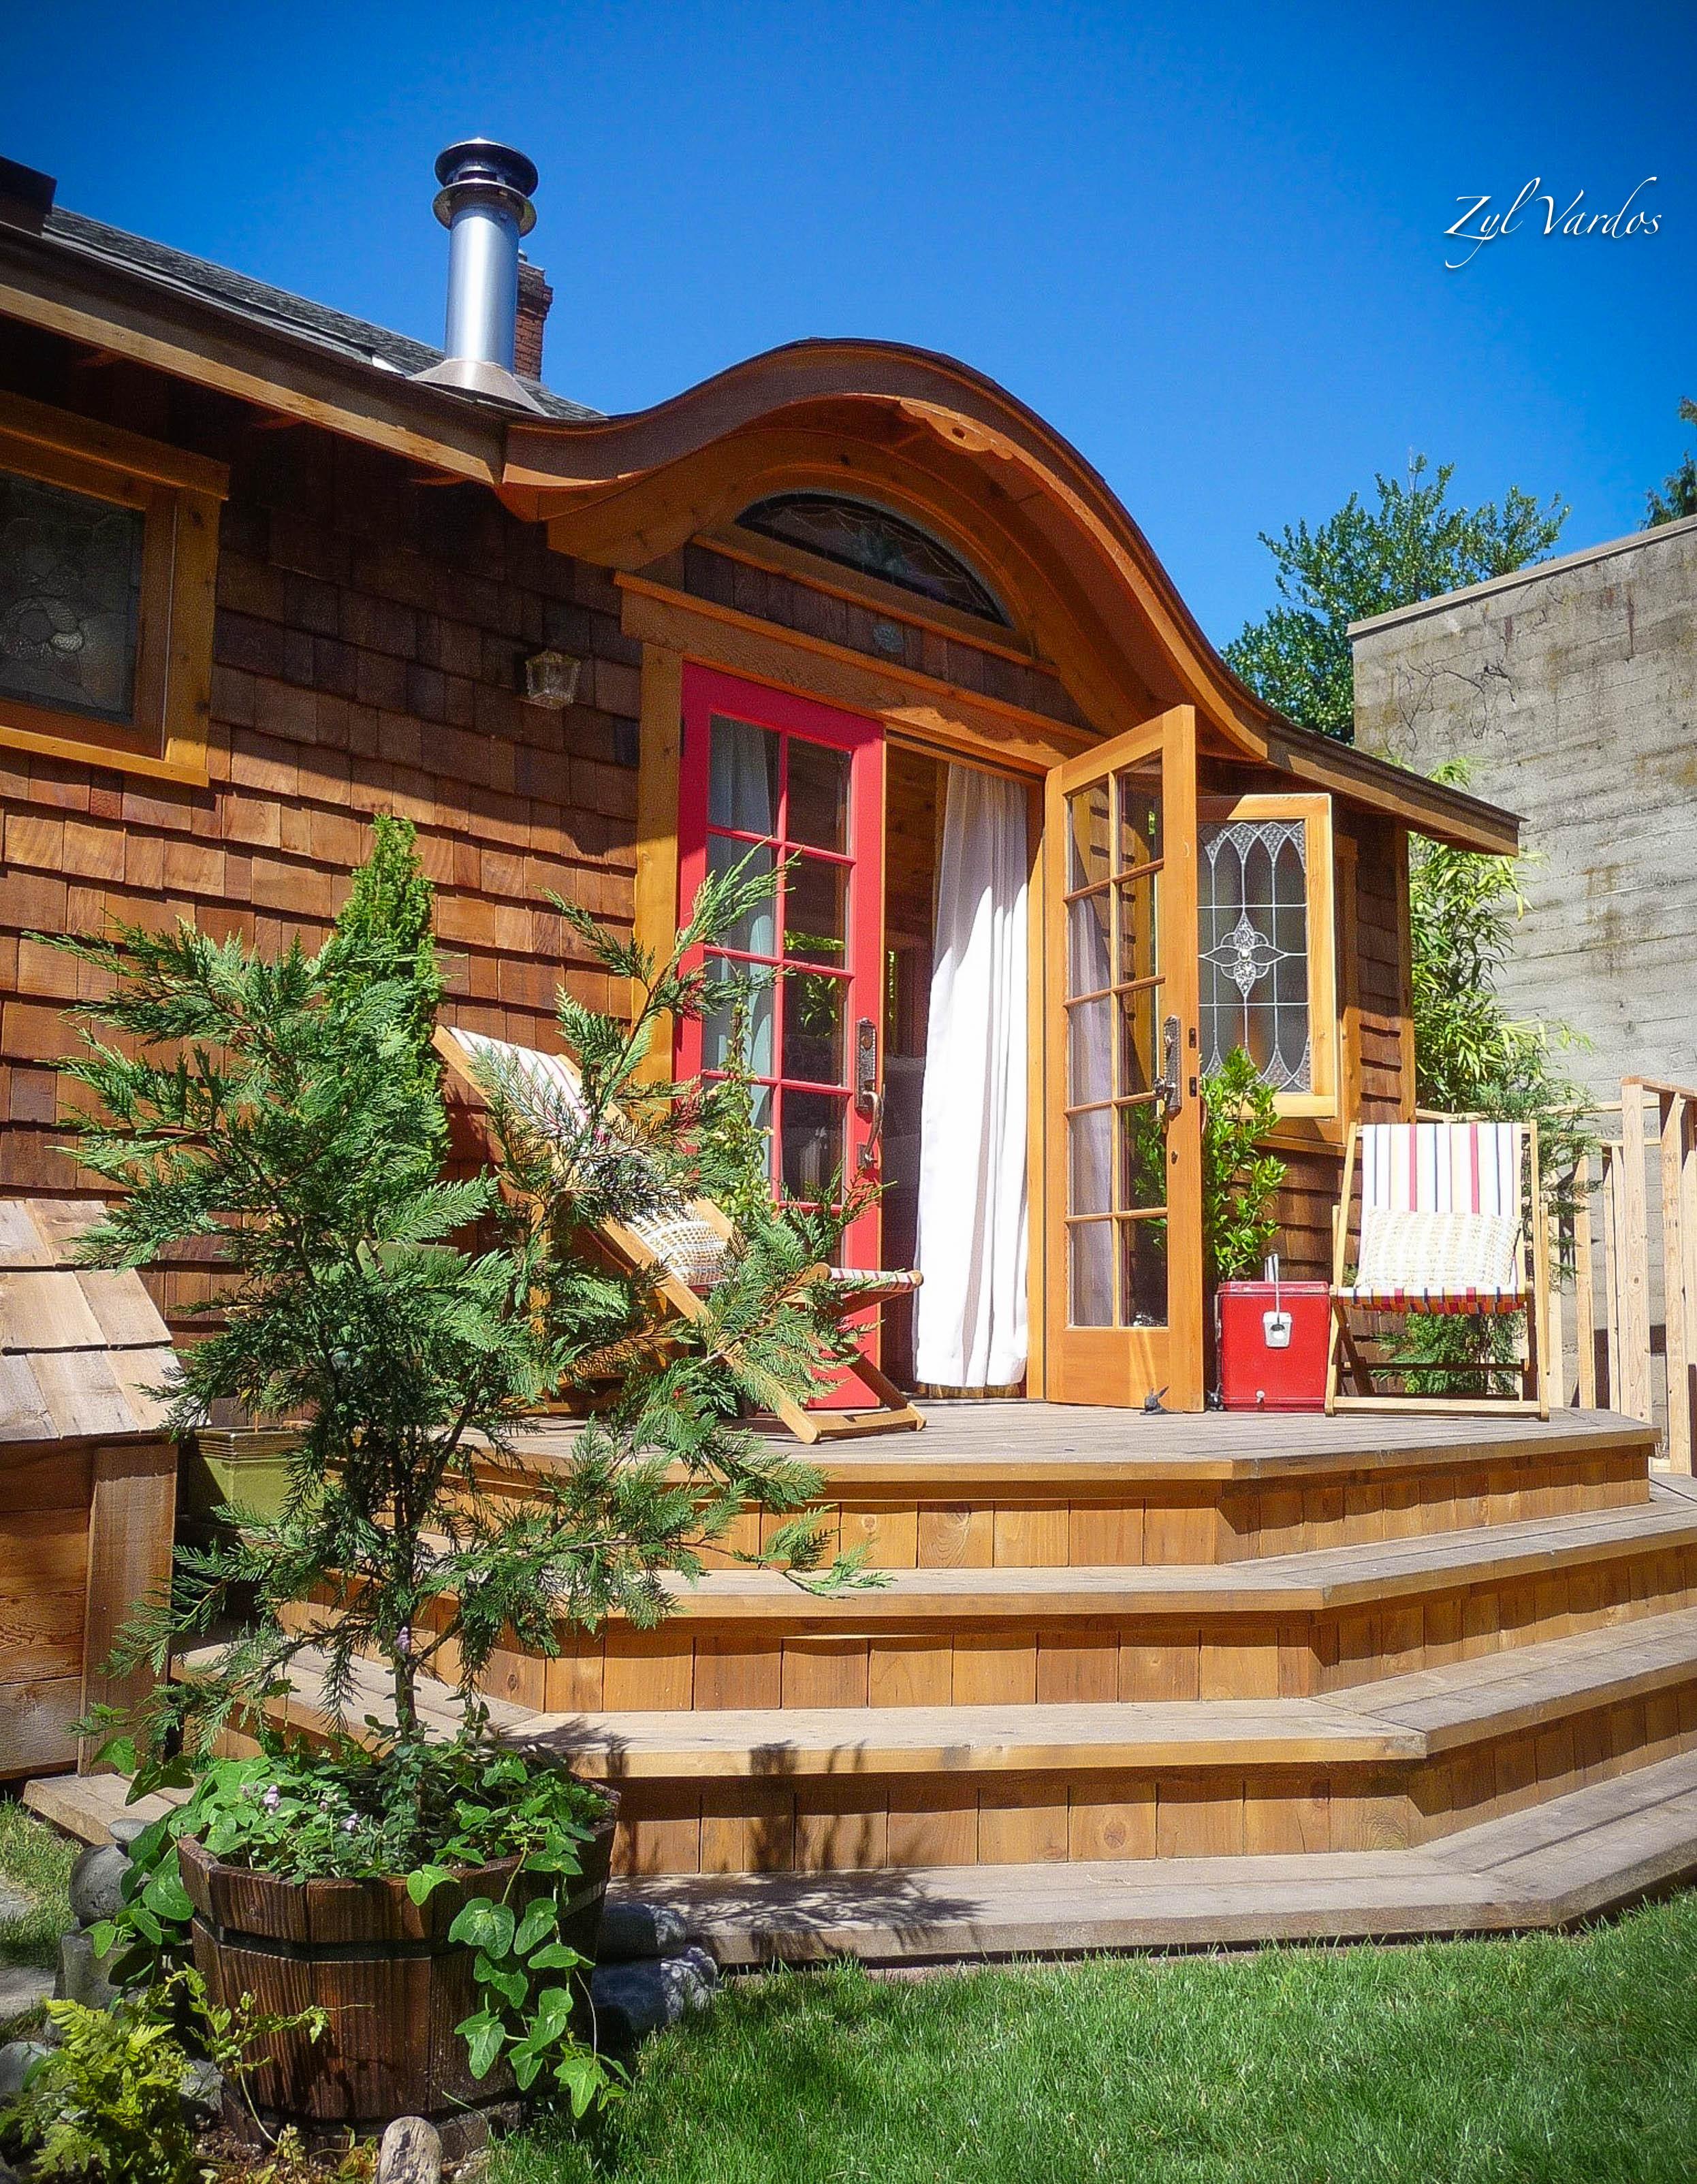 little-bird-tiny-house-porch-zyl-vardos.jpg